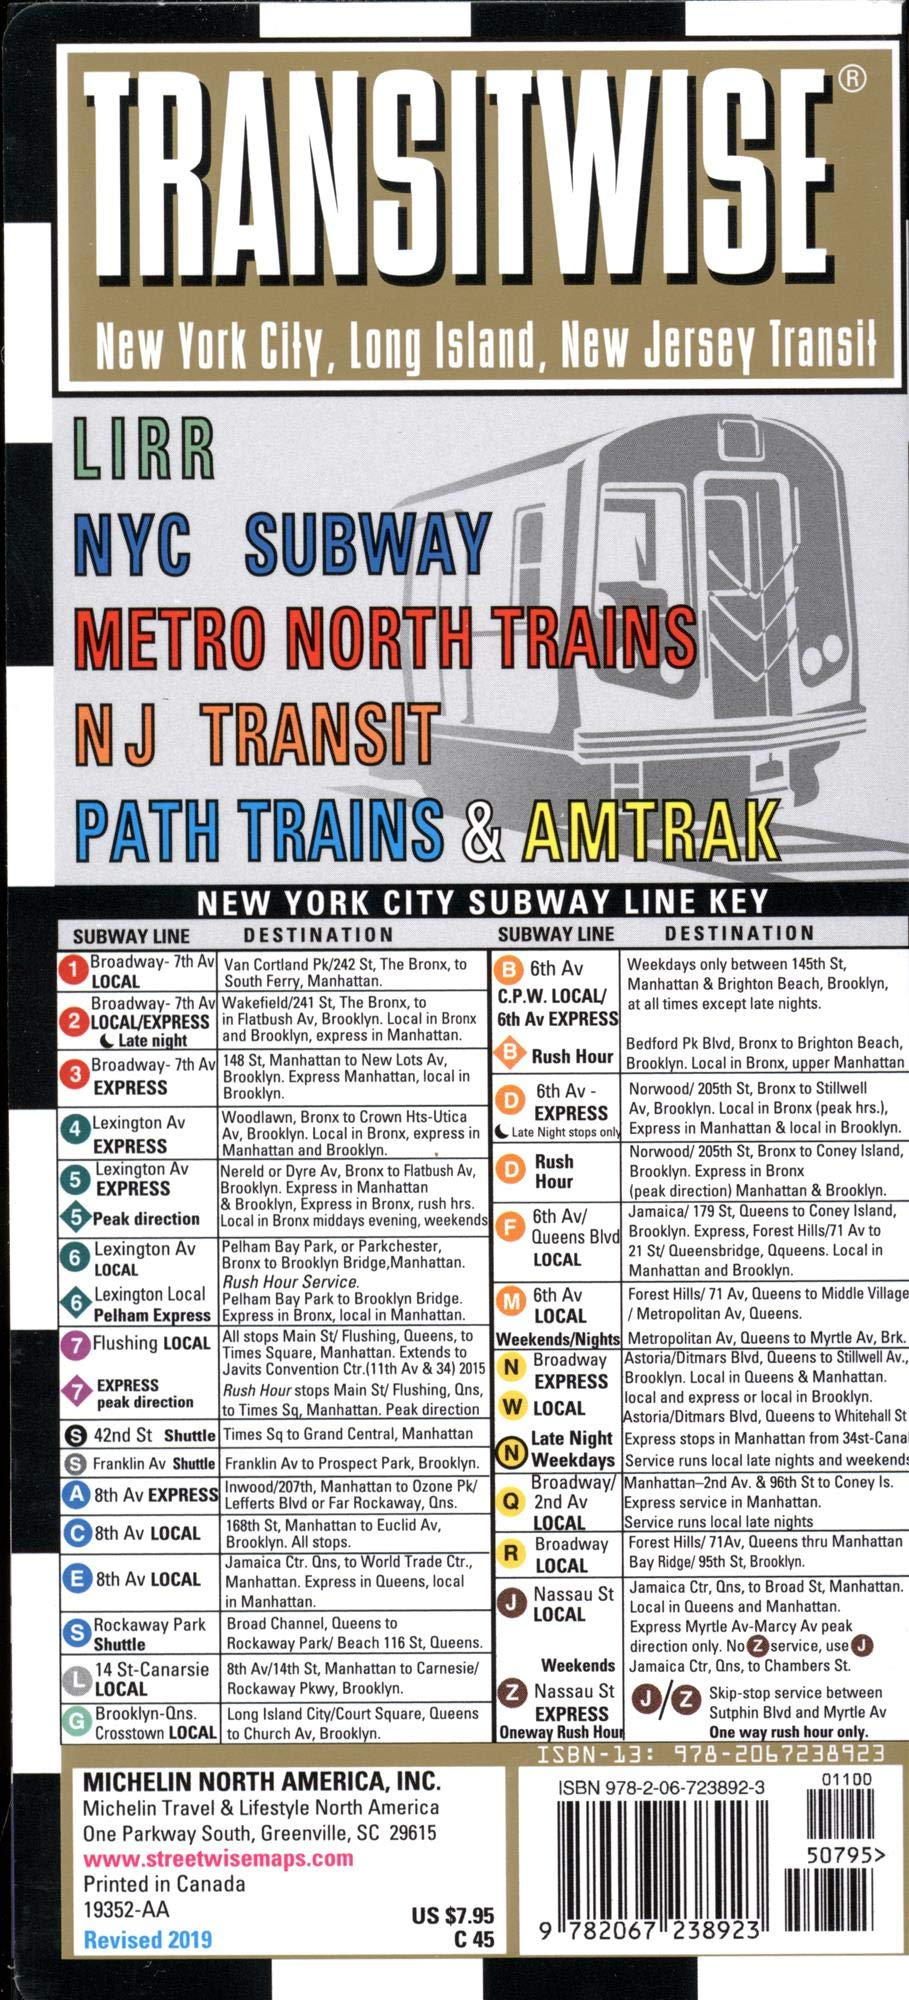 Subway Map Nyc D Train.Transitwise New York New Jersey Metro Transit Map Lirr Nyc Subway